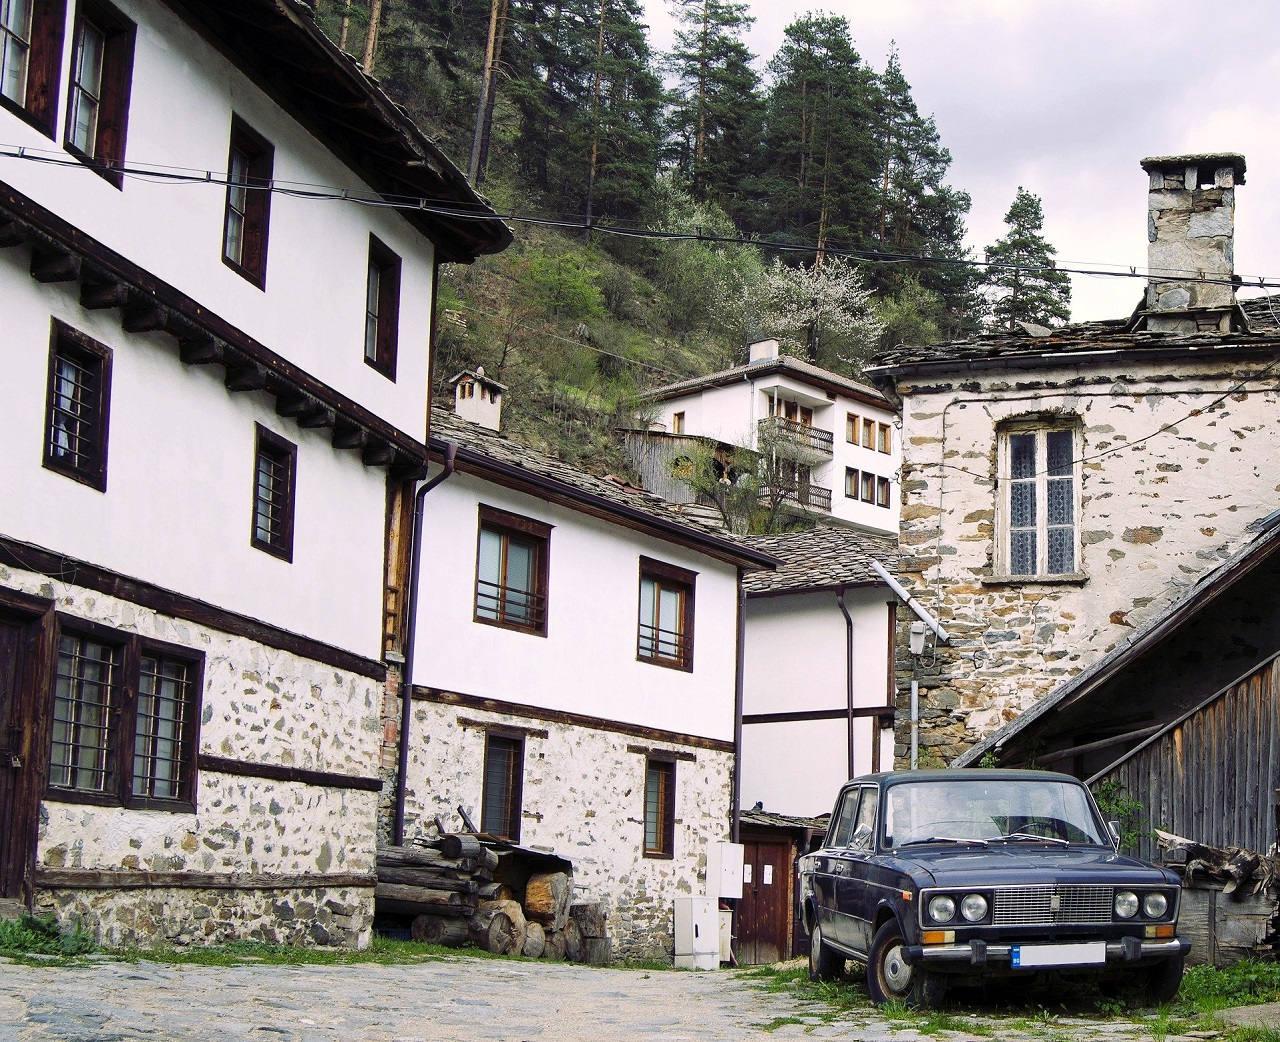 Houses in Shiroka Laka